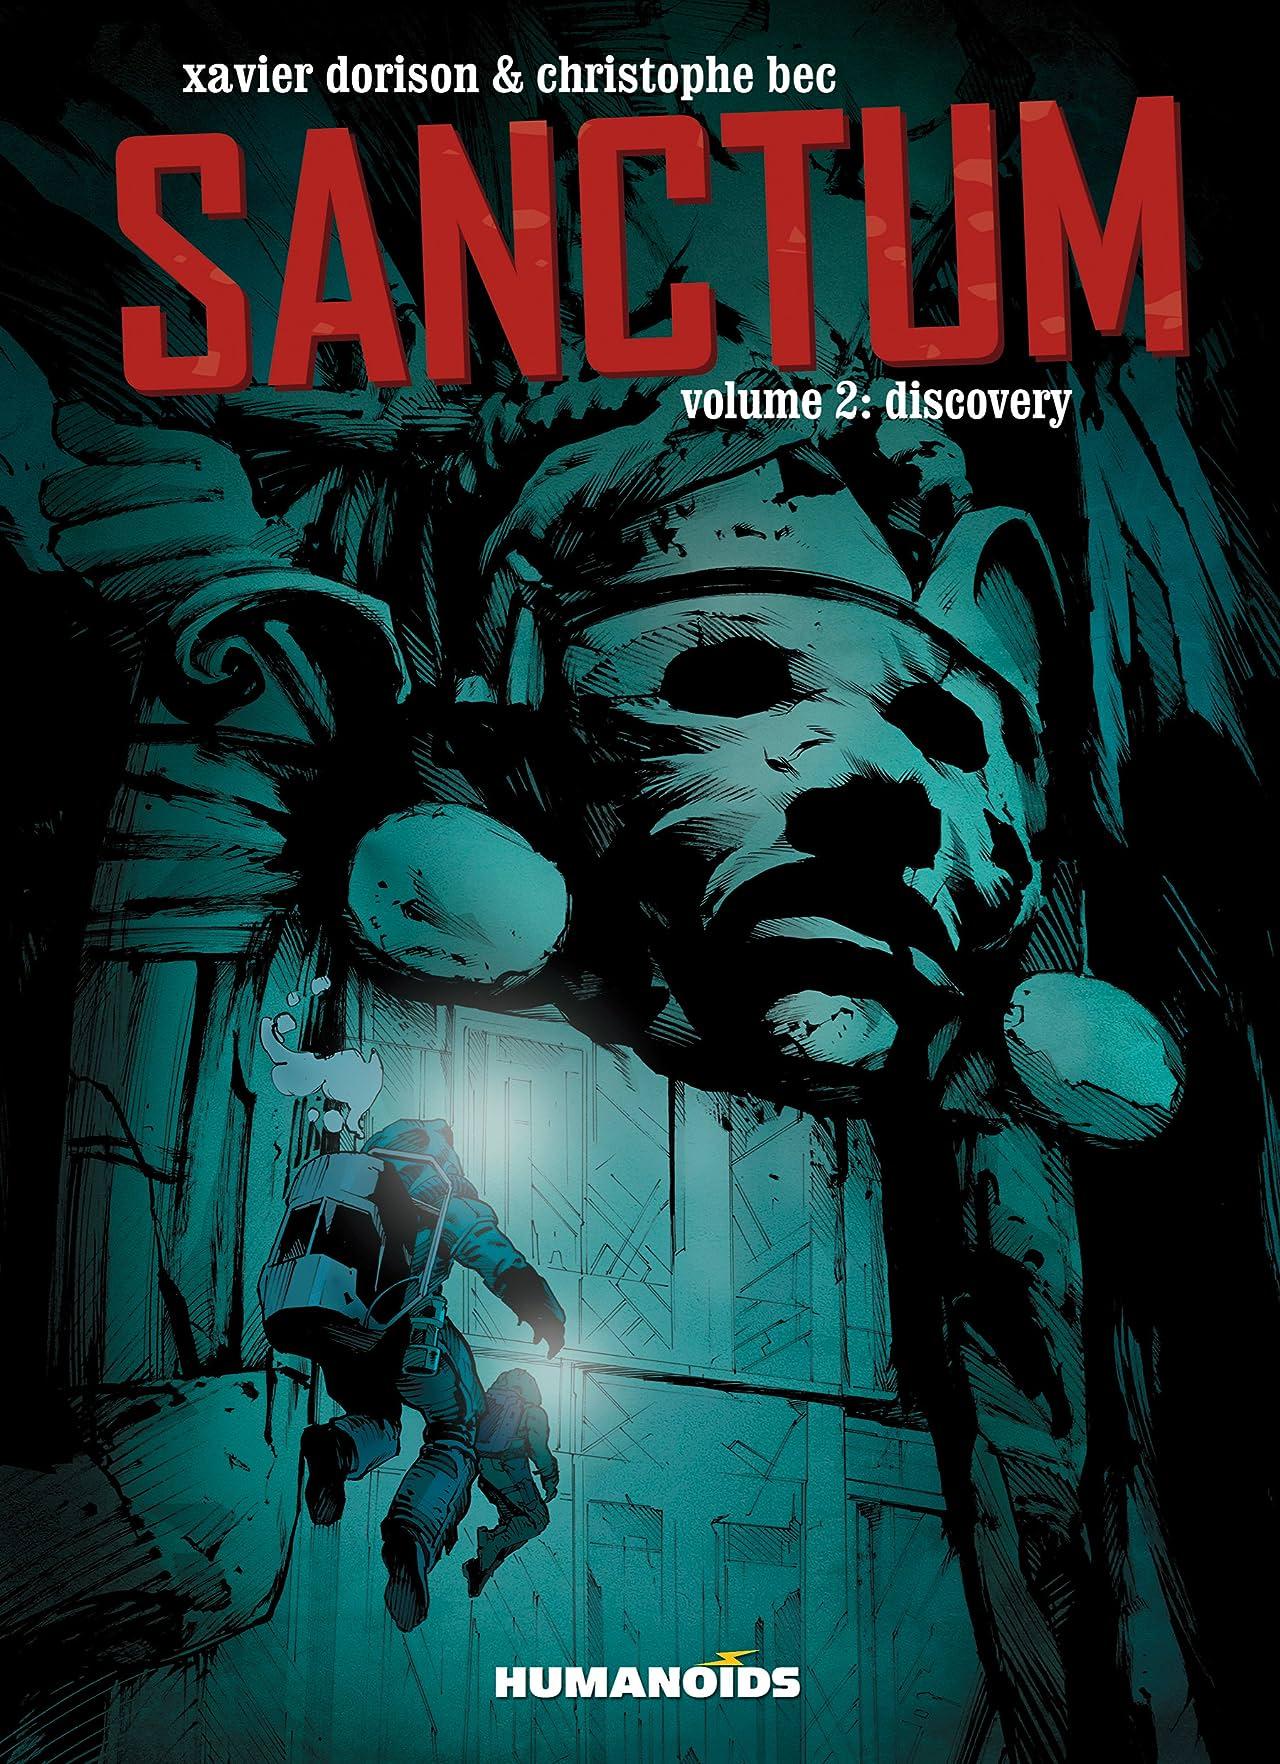 Sanctum Vol. 2: Discovery